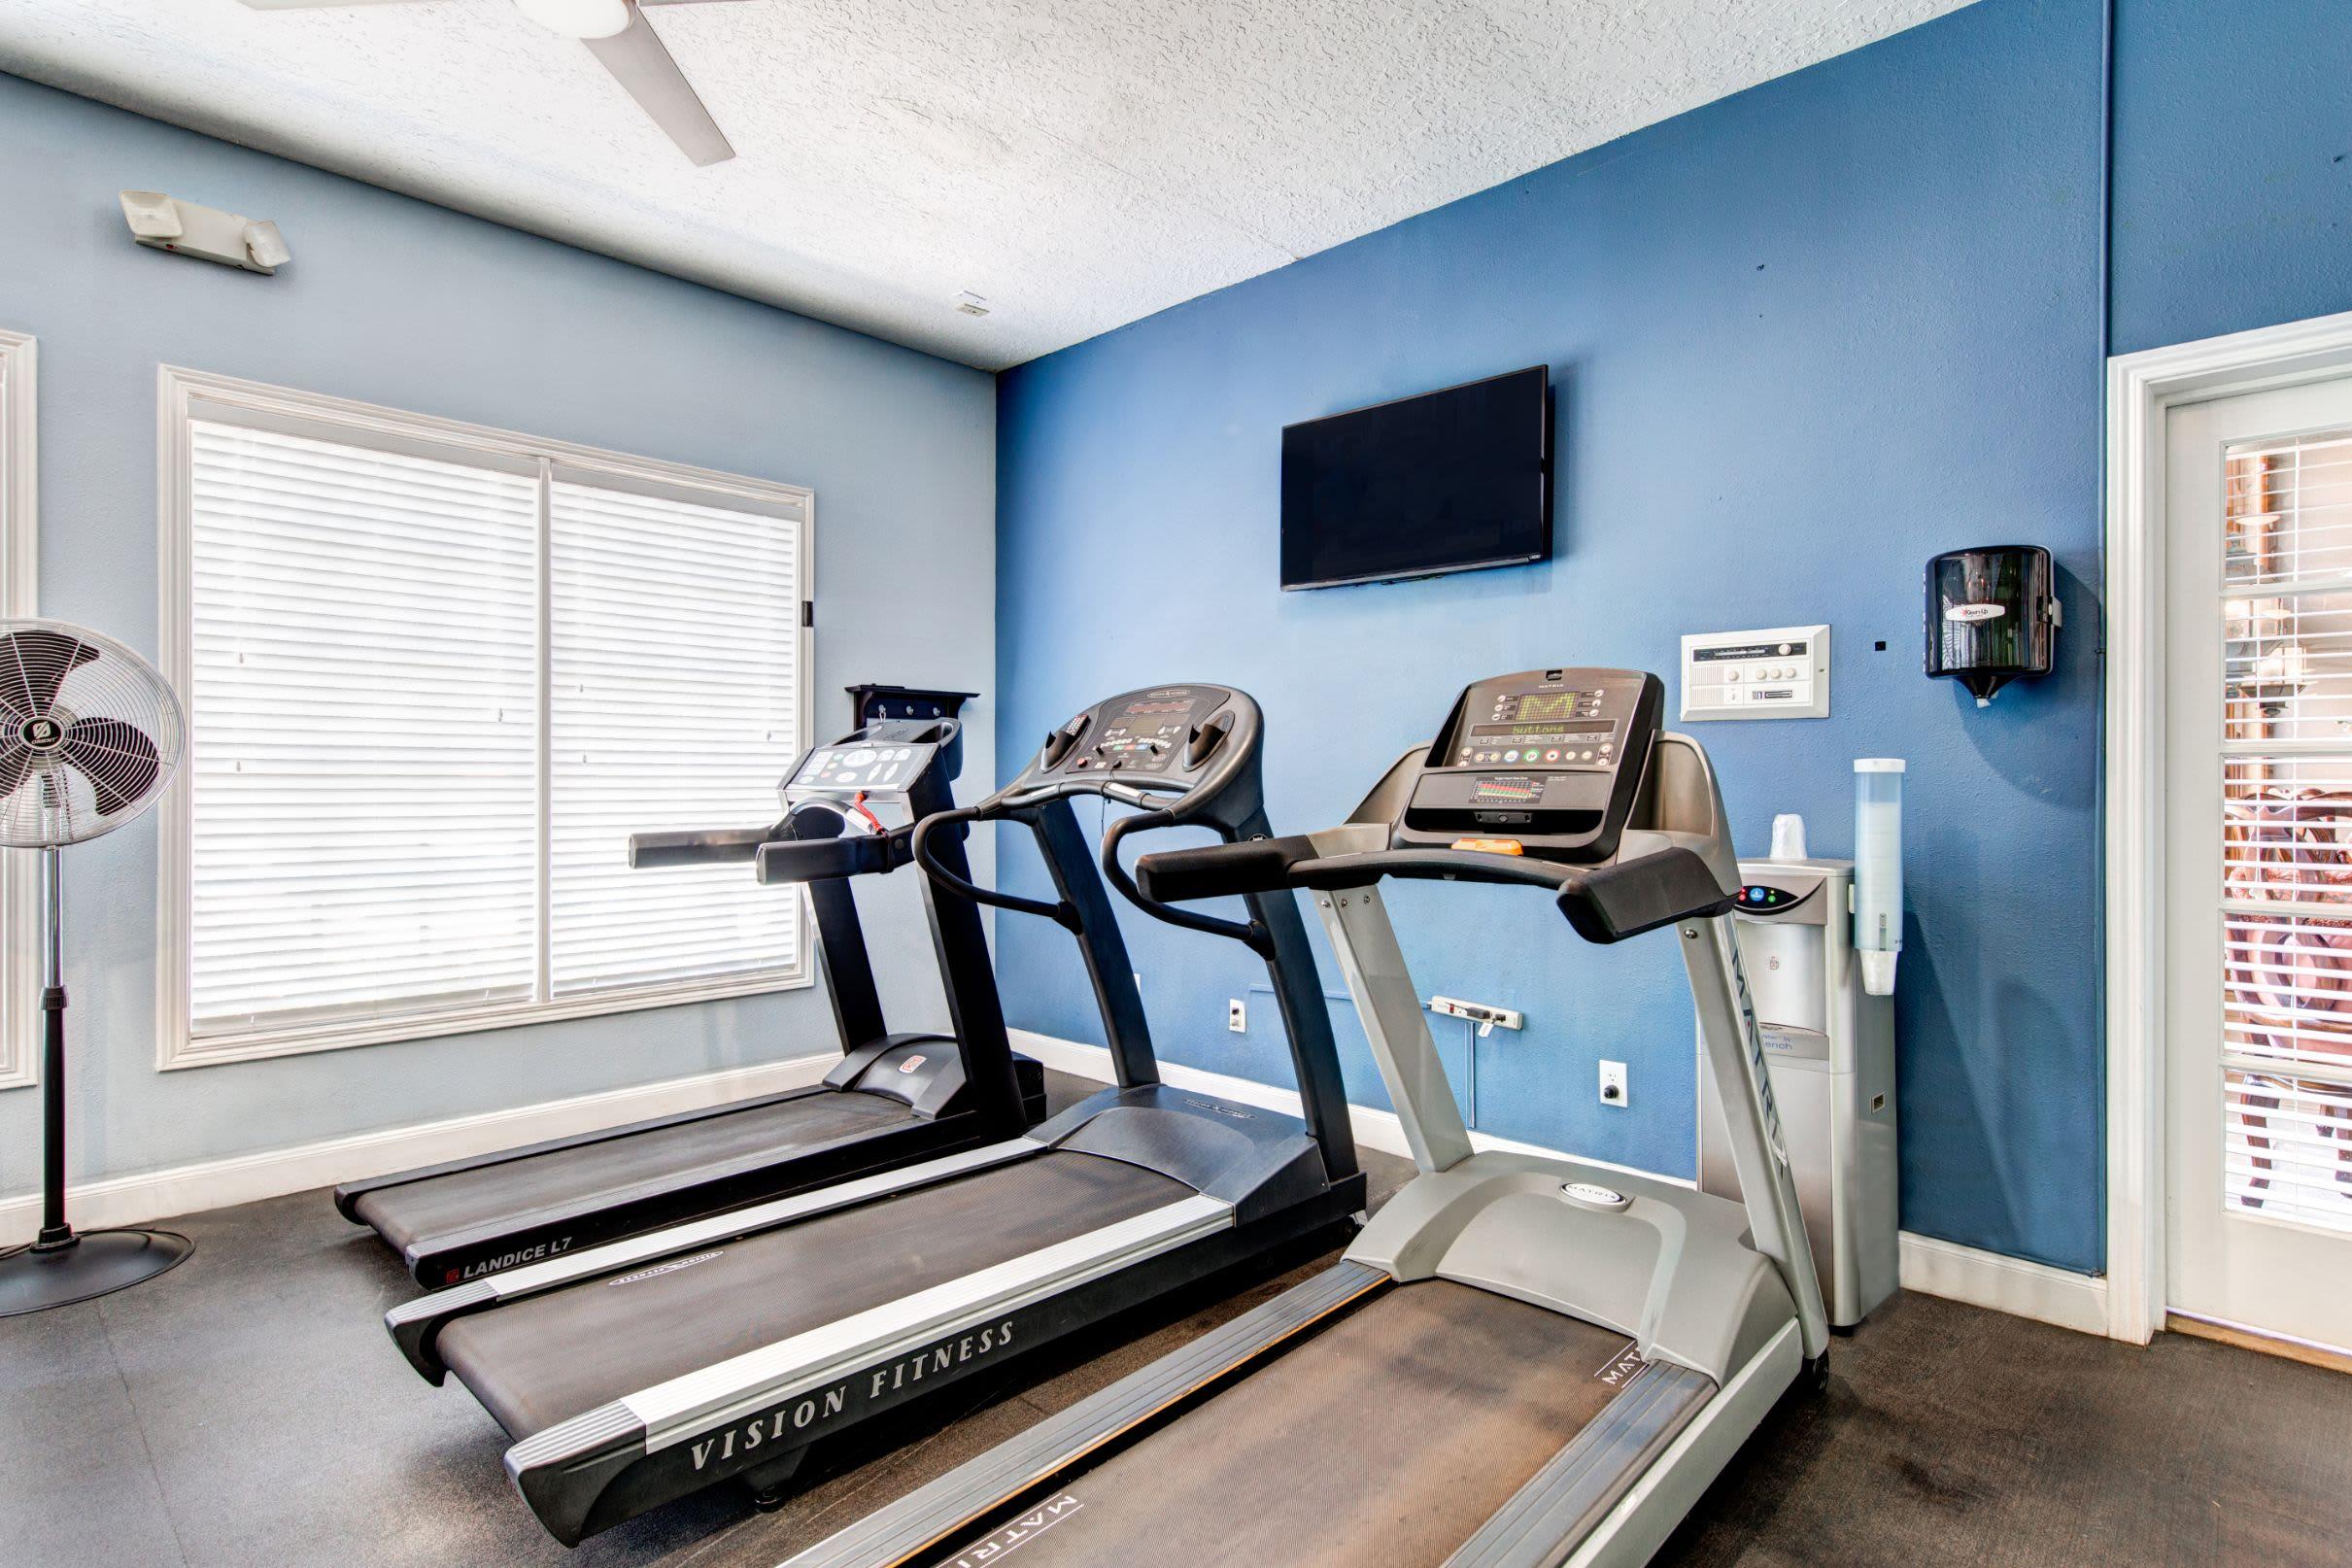 Row of treadmills with a TV at Marquis at Silverton in Cary, North Carolina